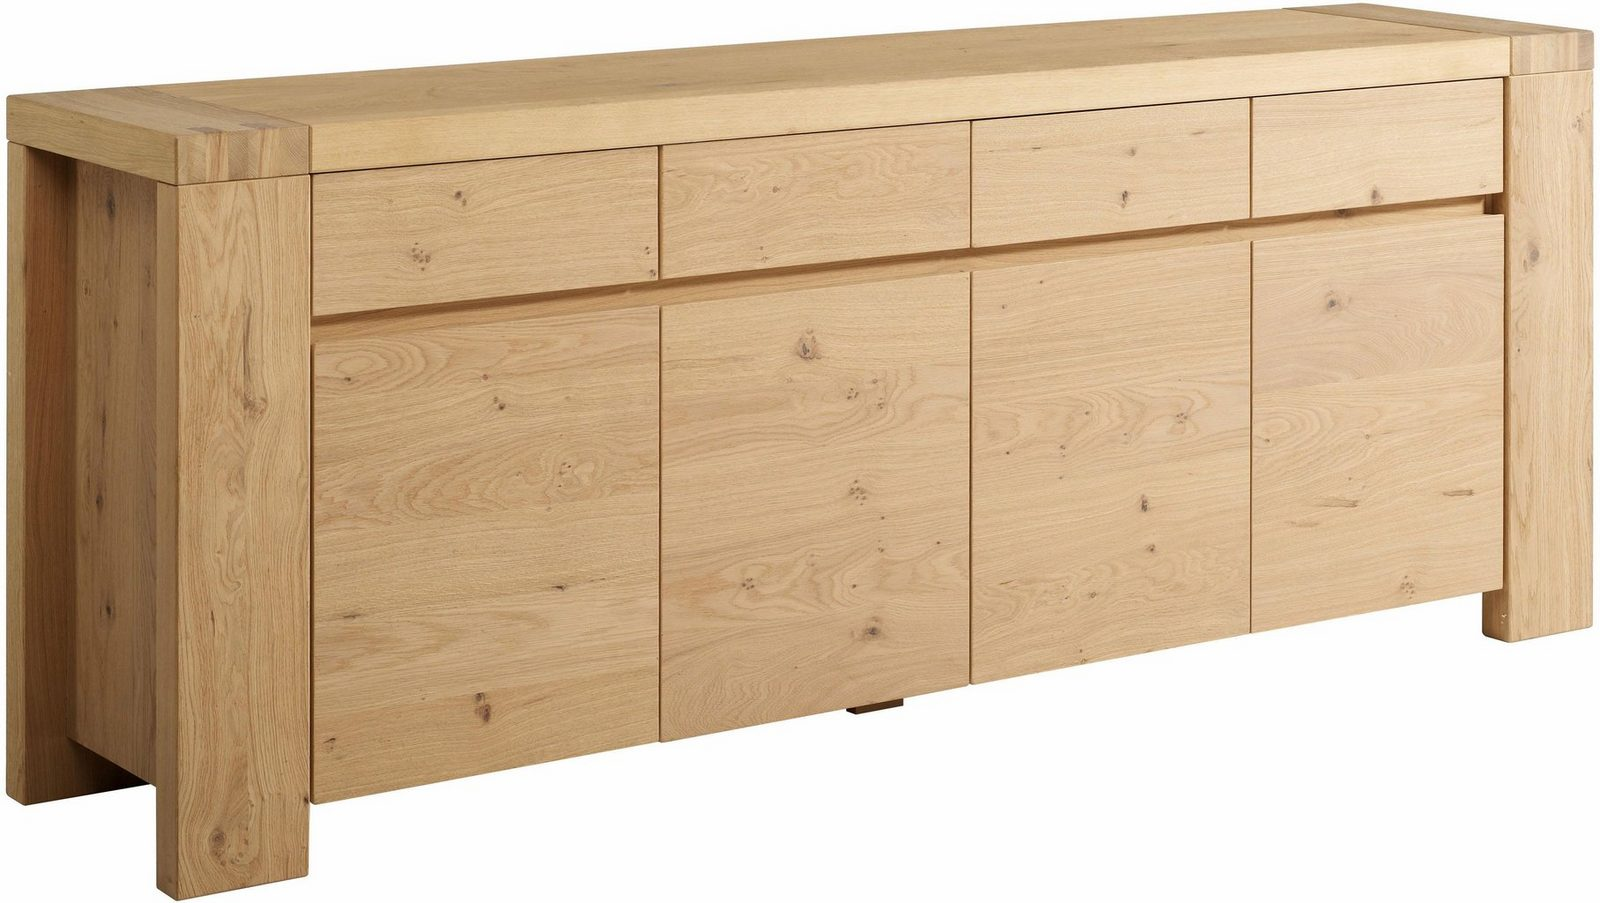 Home affaire Sideboard «Elina», Breite 225 cm - broschei